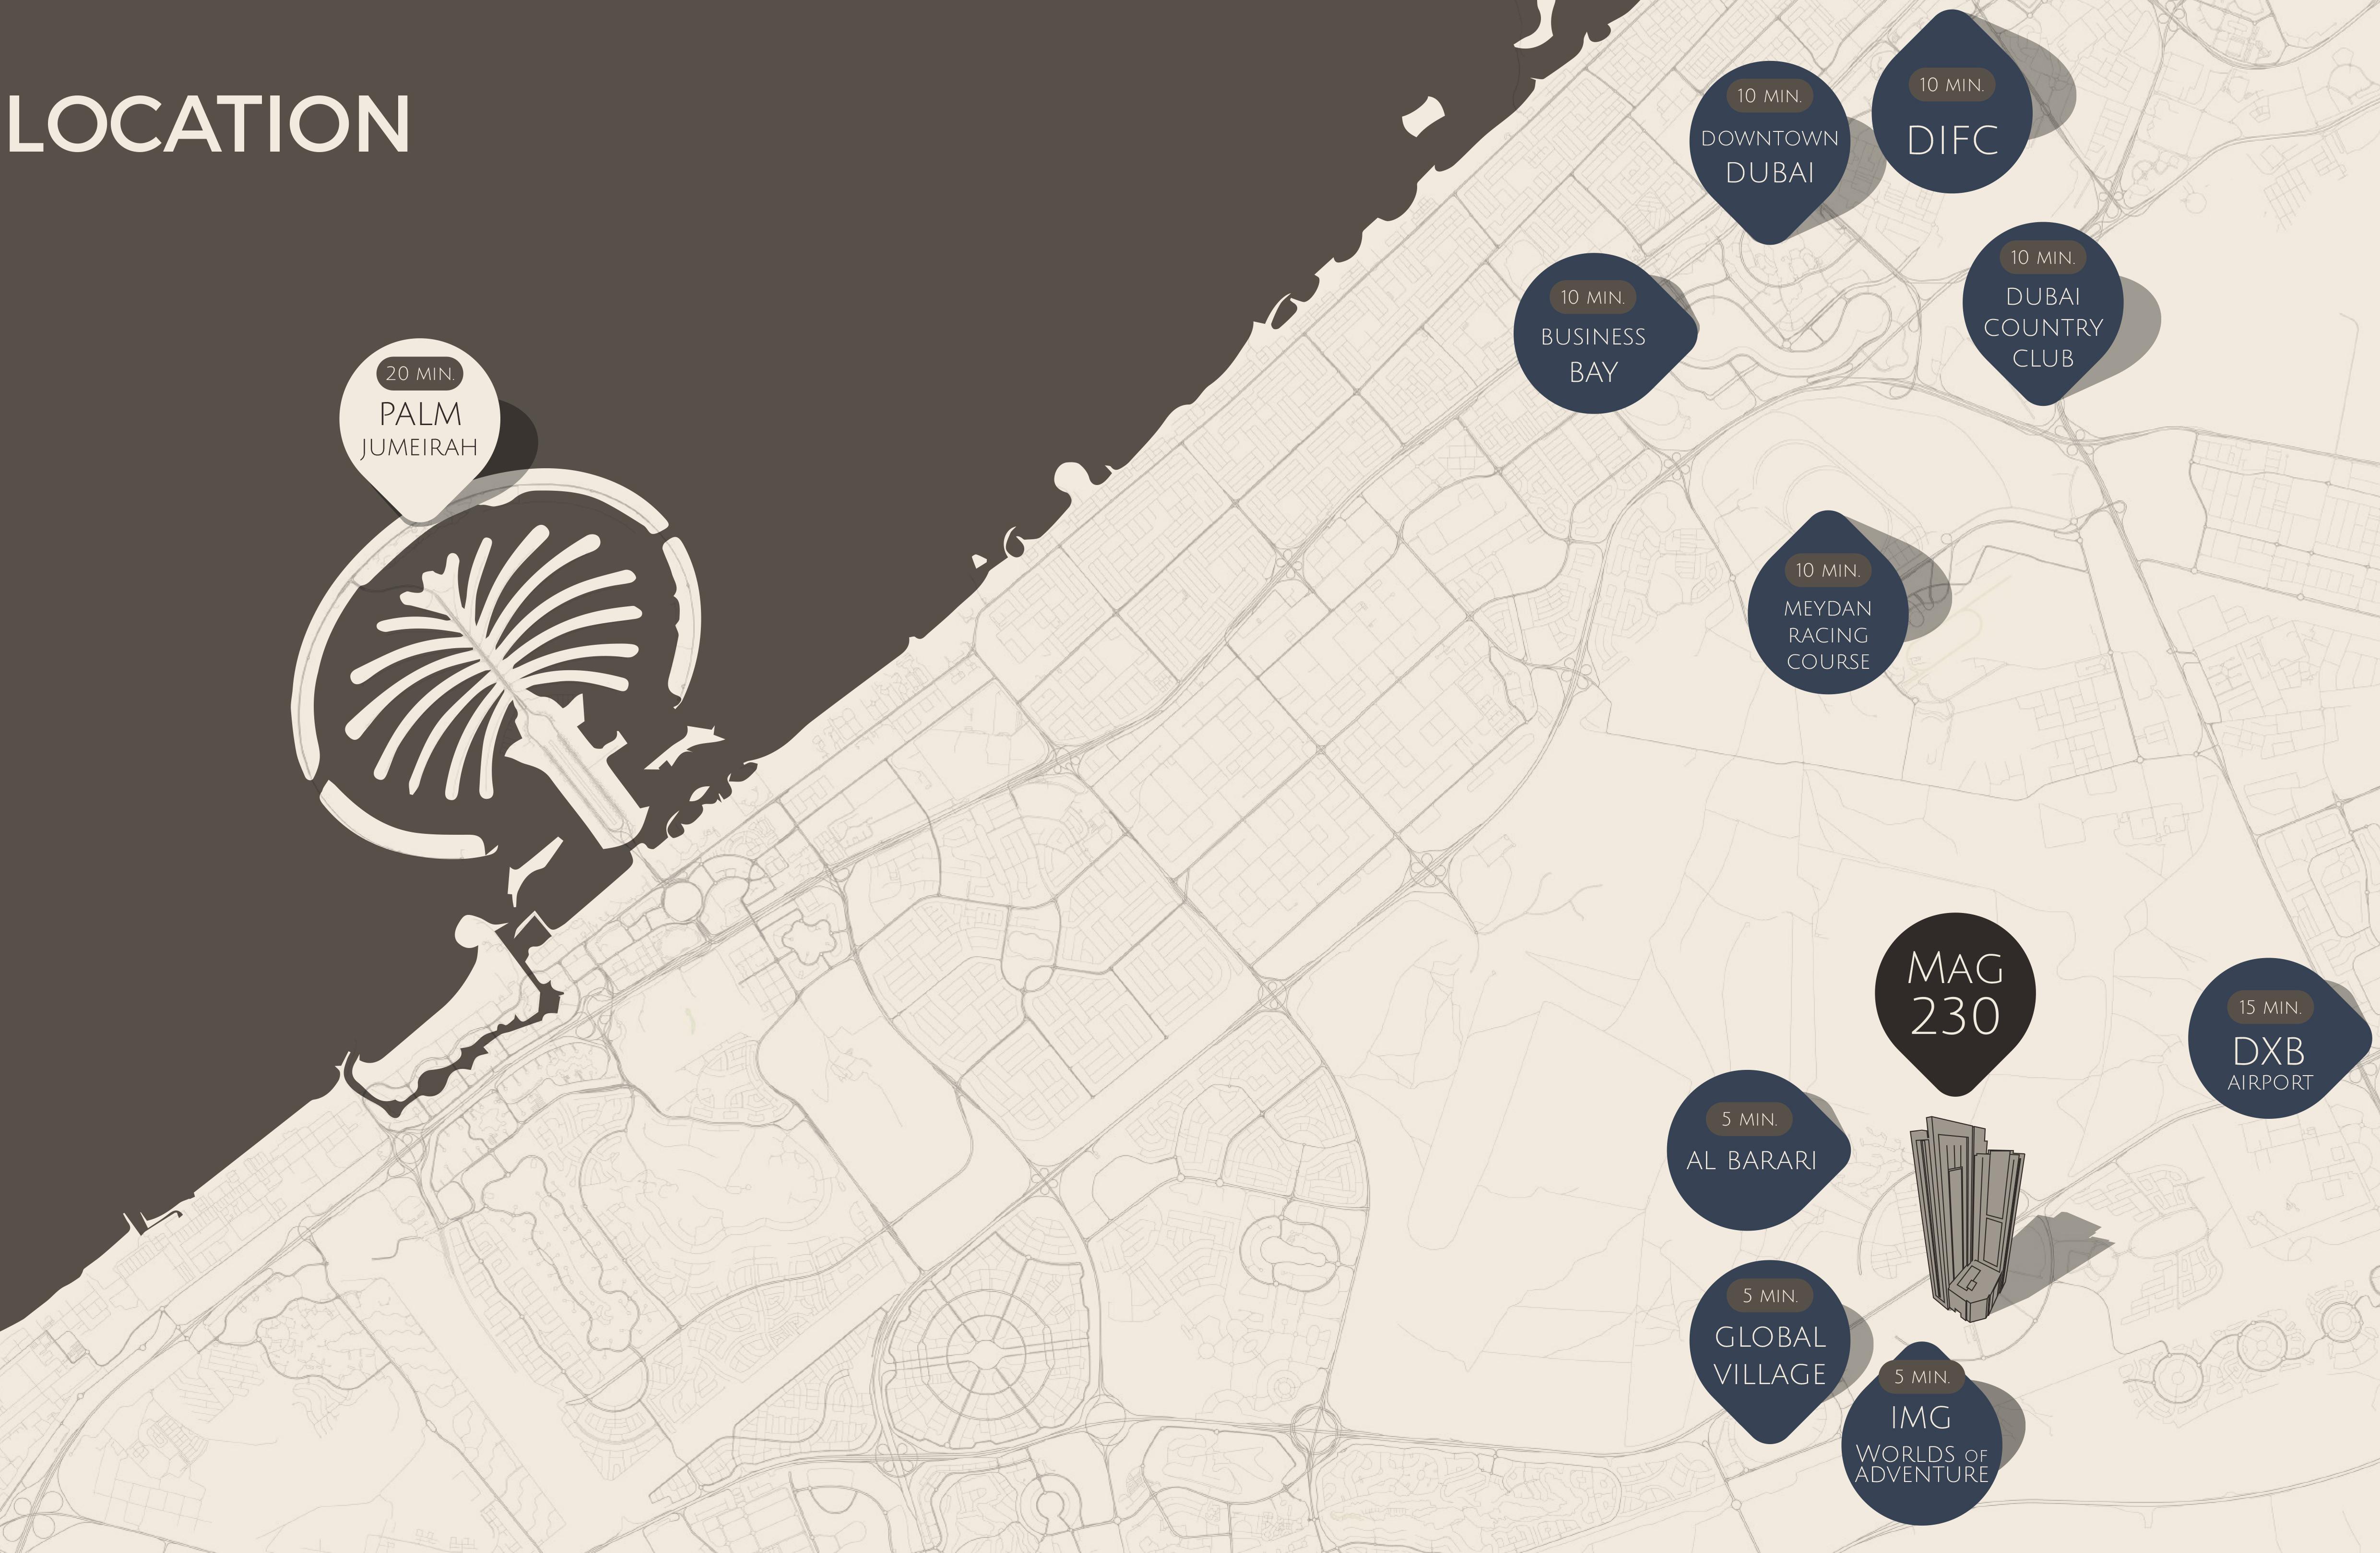 MAG 230 Apartments -  Location Plan